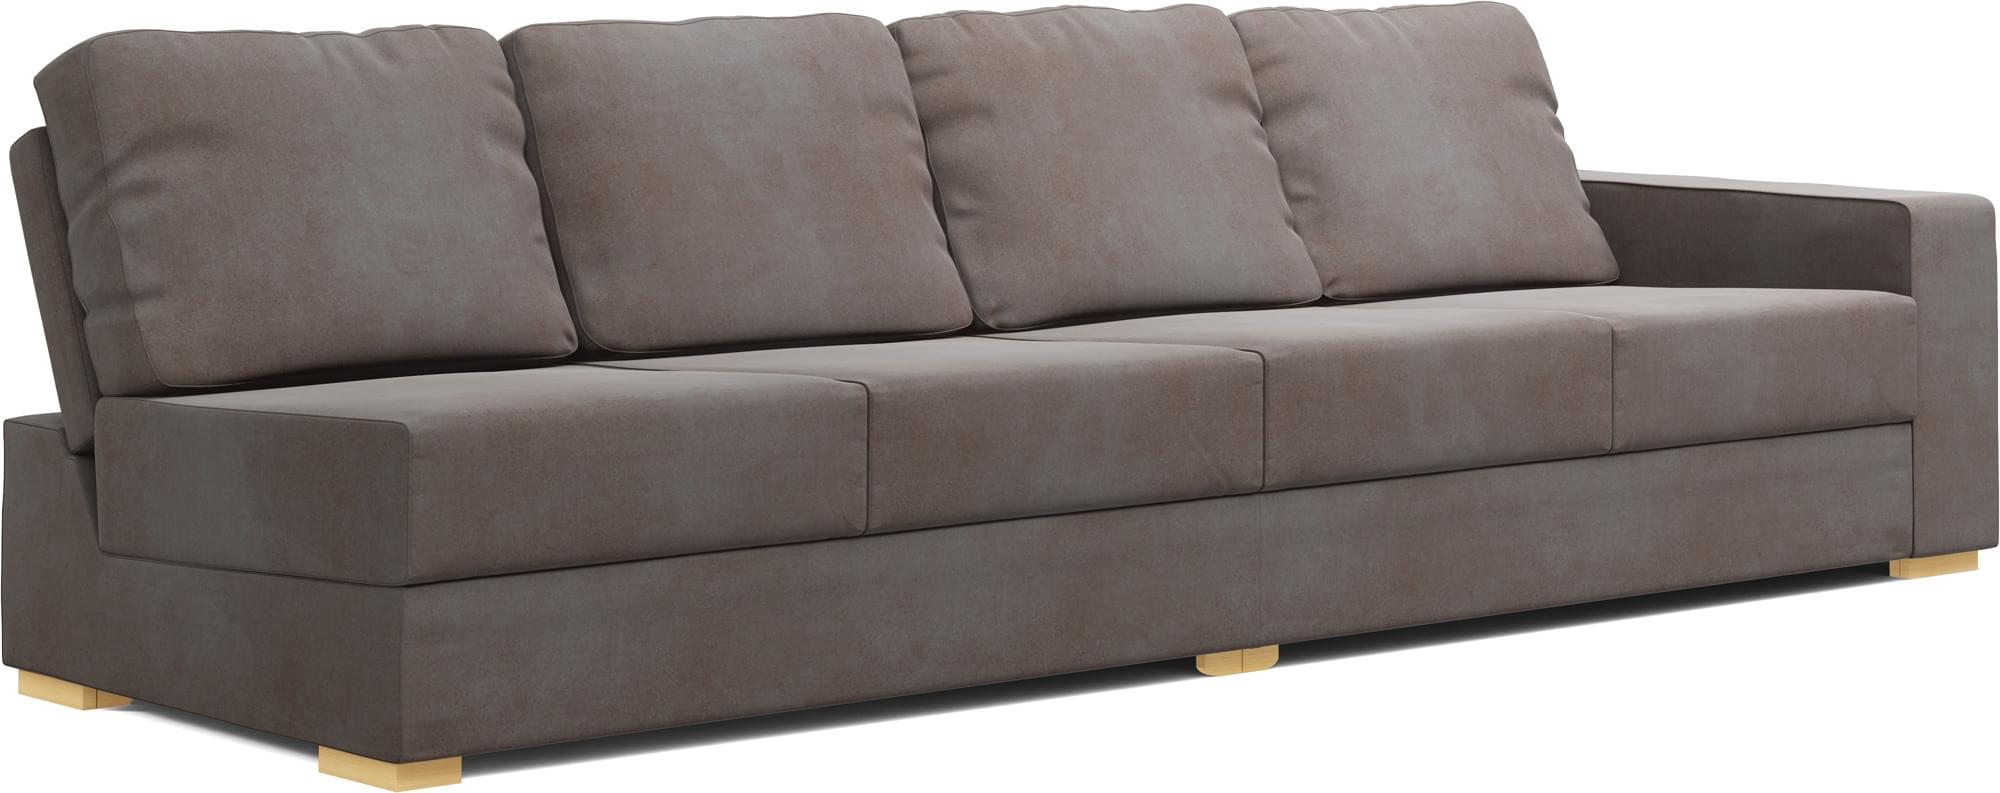 armless armchairs uk revolving chair manufacturer alda one 4 seat sofa - sofas   nabru